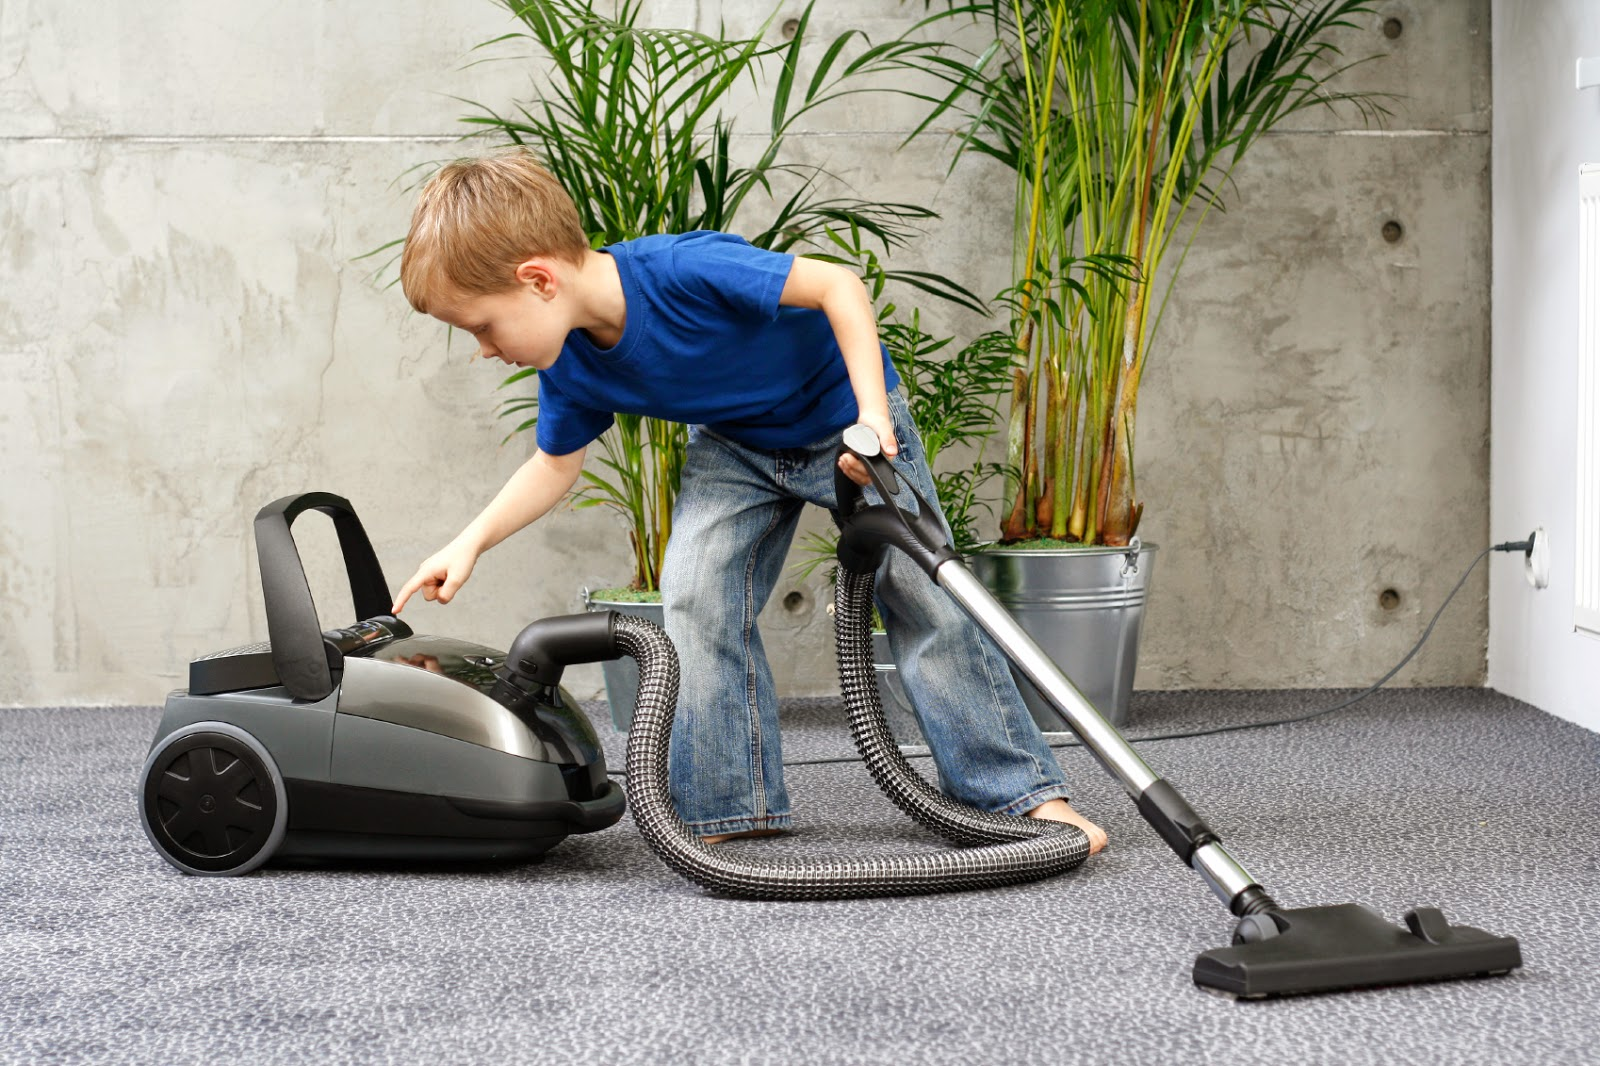 Kerja Rumah Yang Sesuai Mengikut Umur Anak Anda